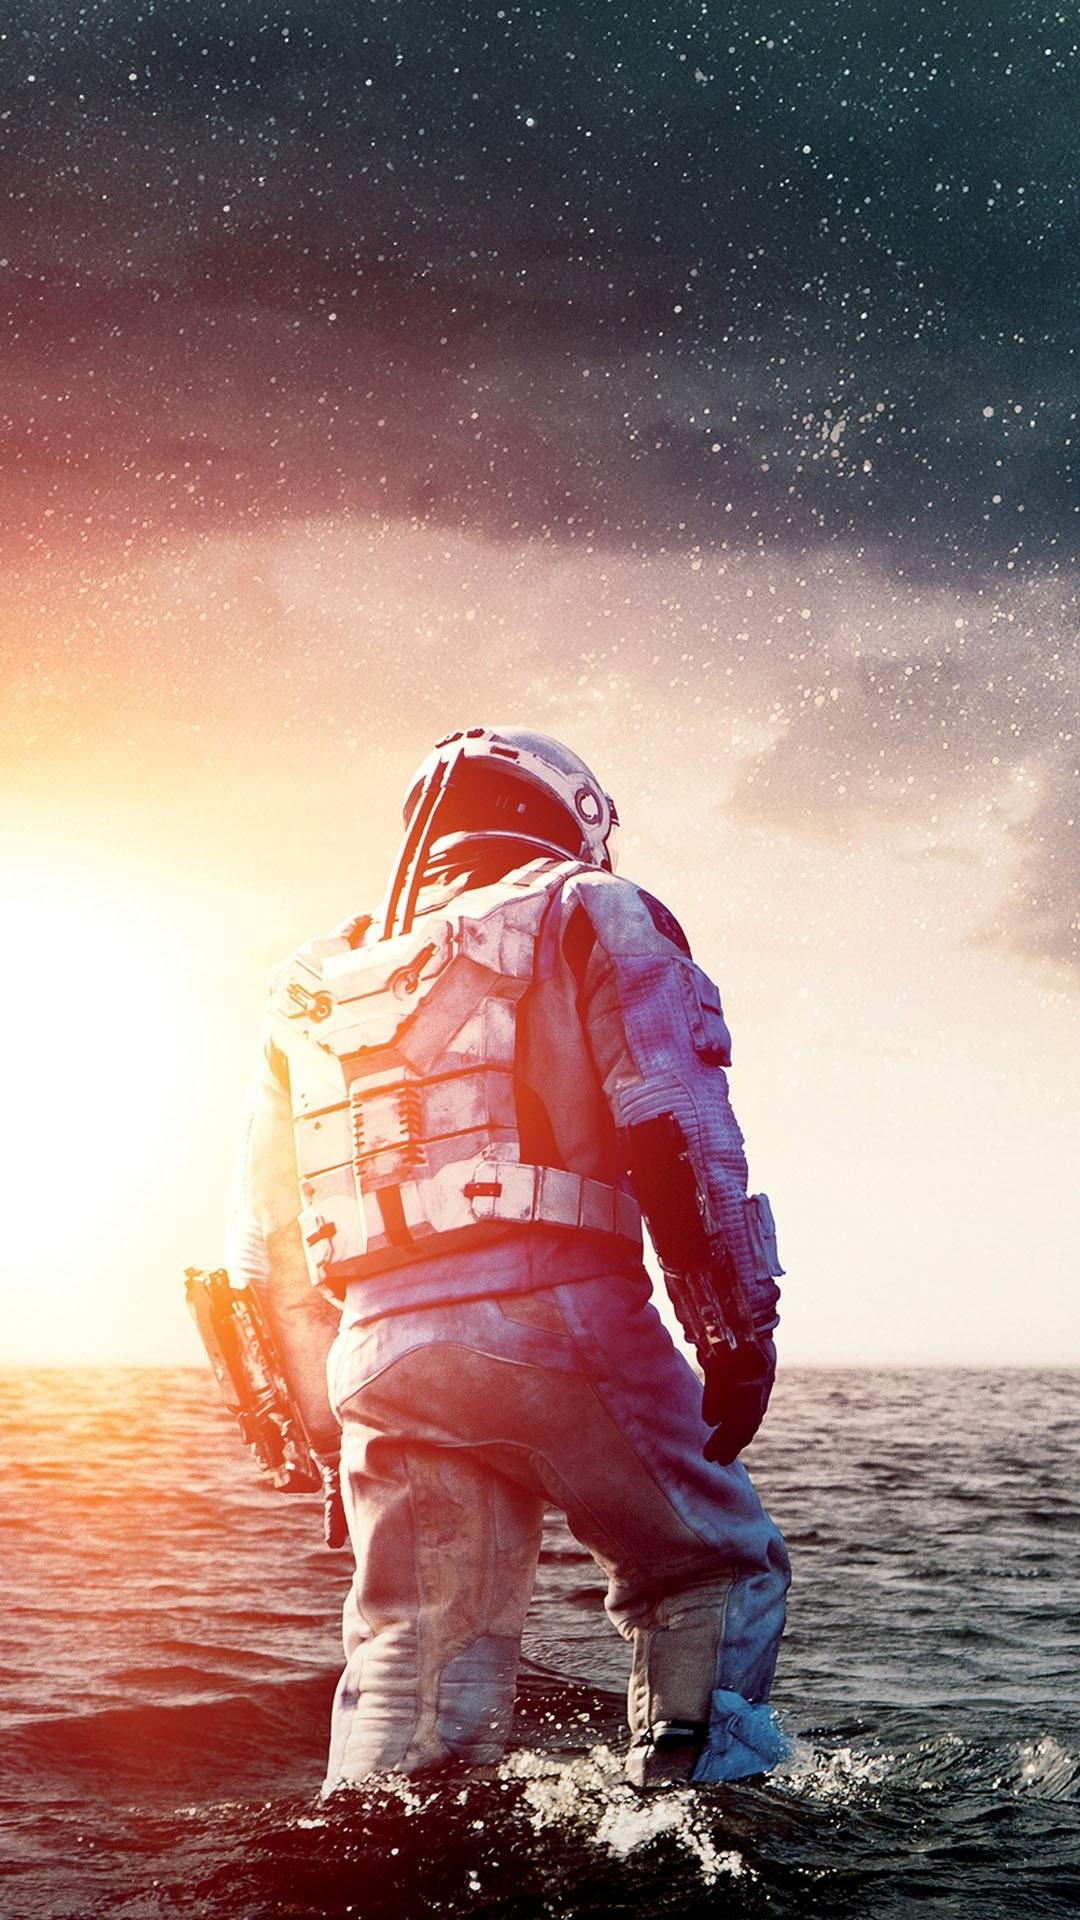 Space Water Interstellar Movie Cool For Guys